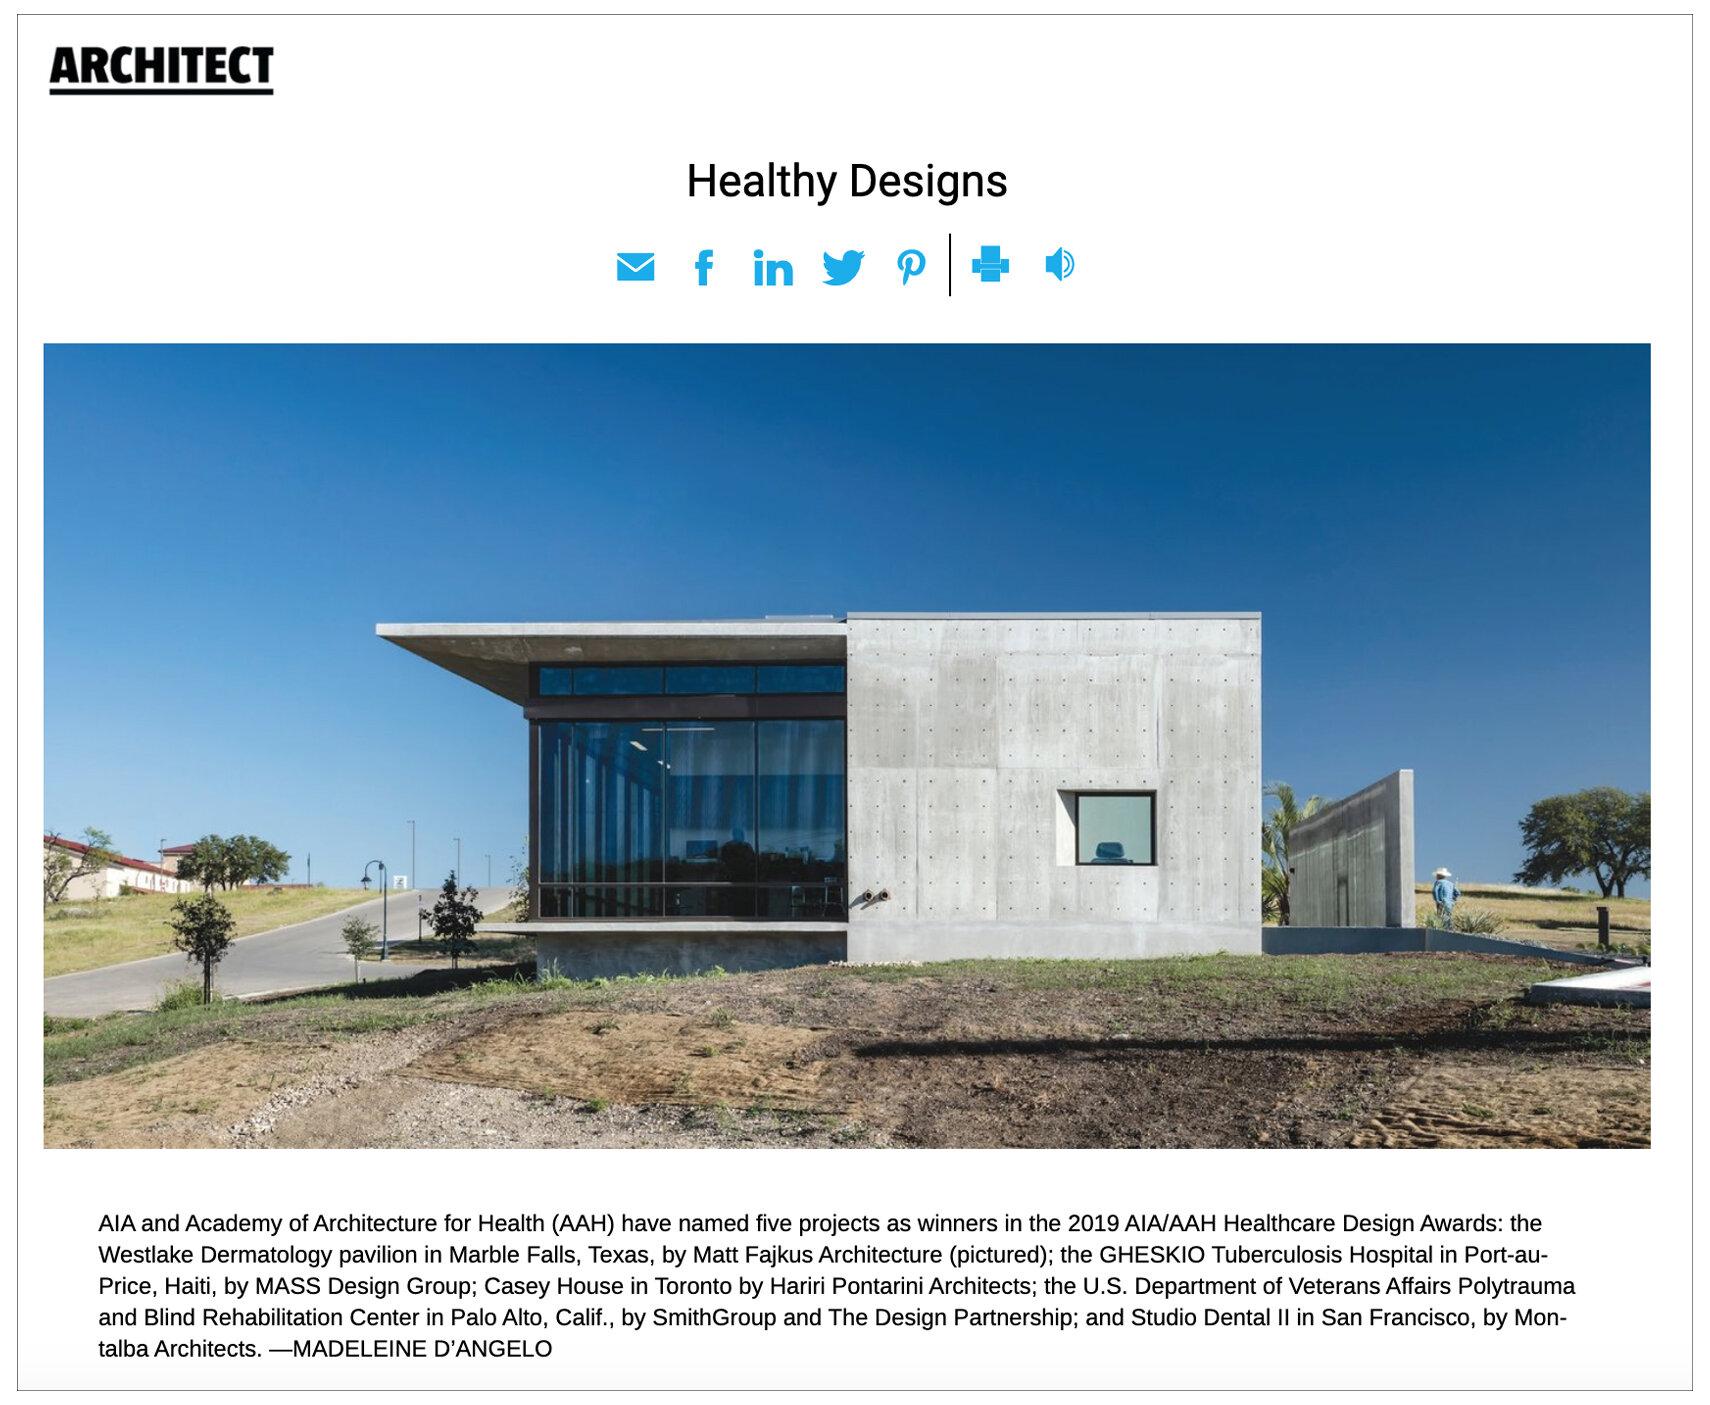 2019_0901 Architect Mag - WDMF-1.jpg